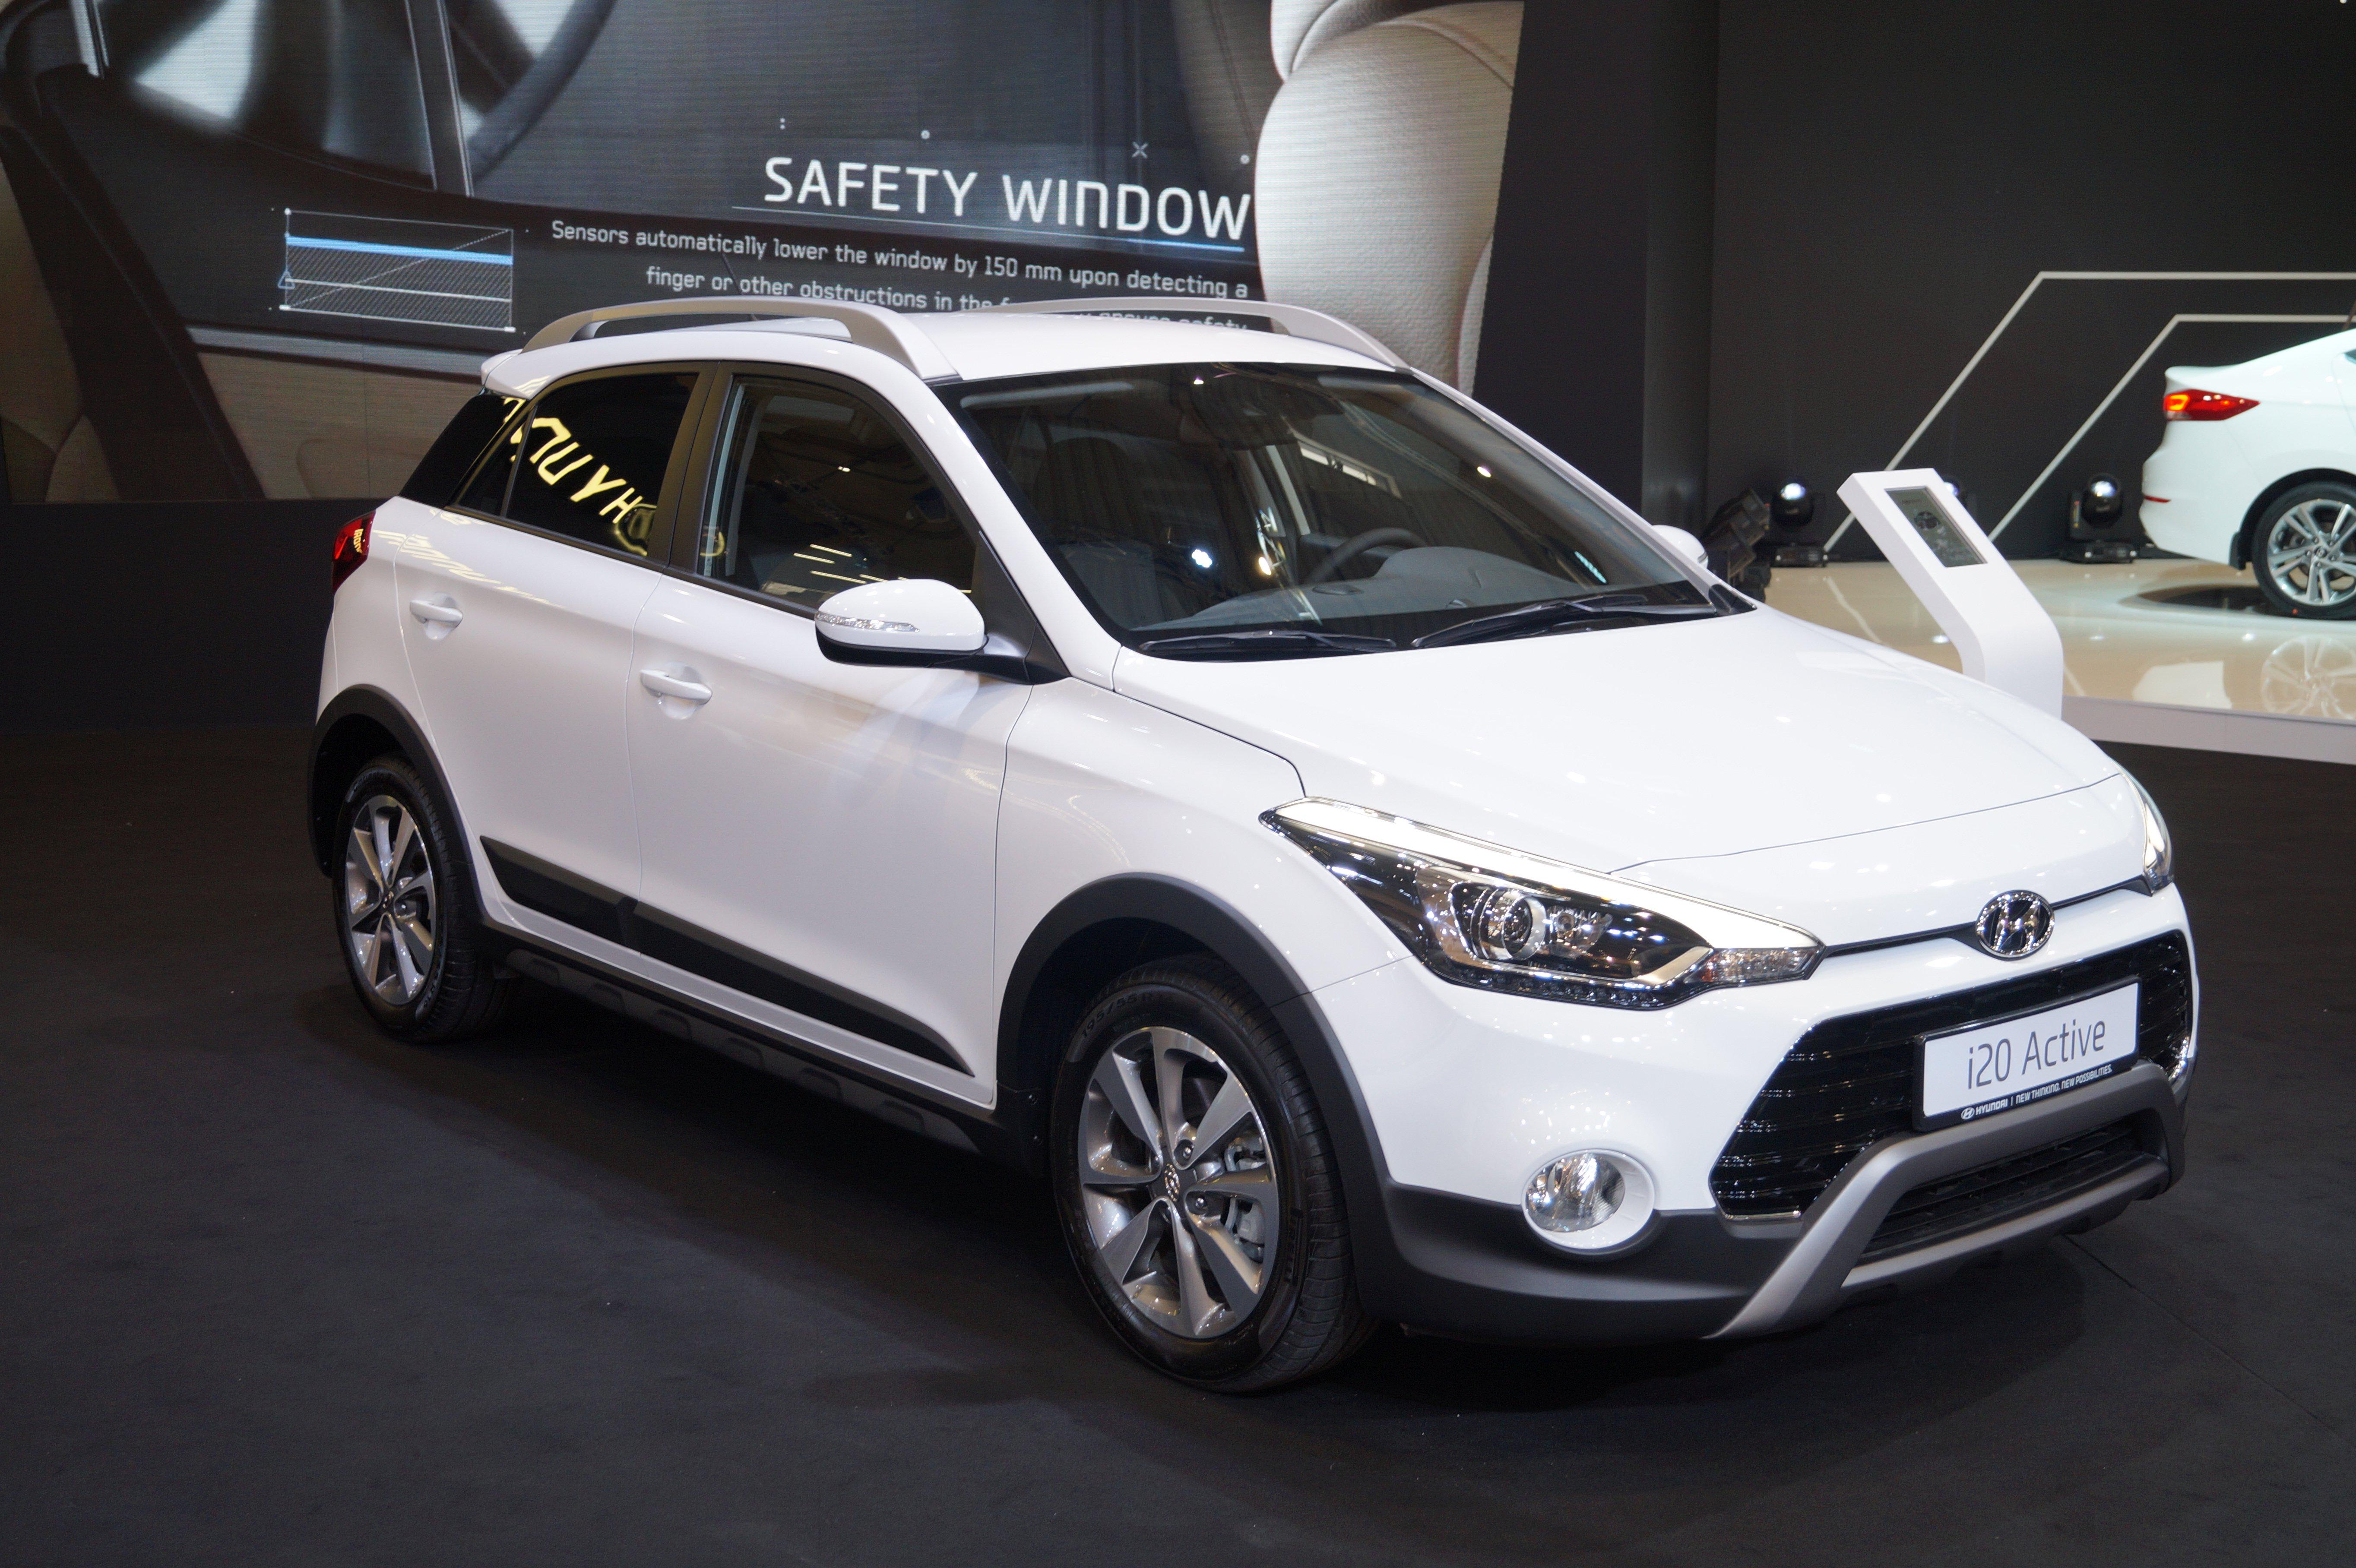 Creta 2017 White >> File:Hyundai i20 Active - przód (MSP16).jpg - Wikimedia ...